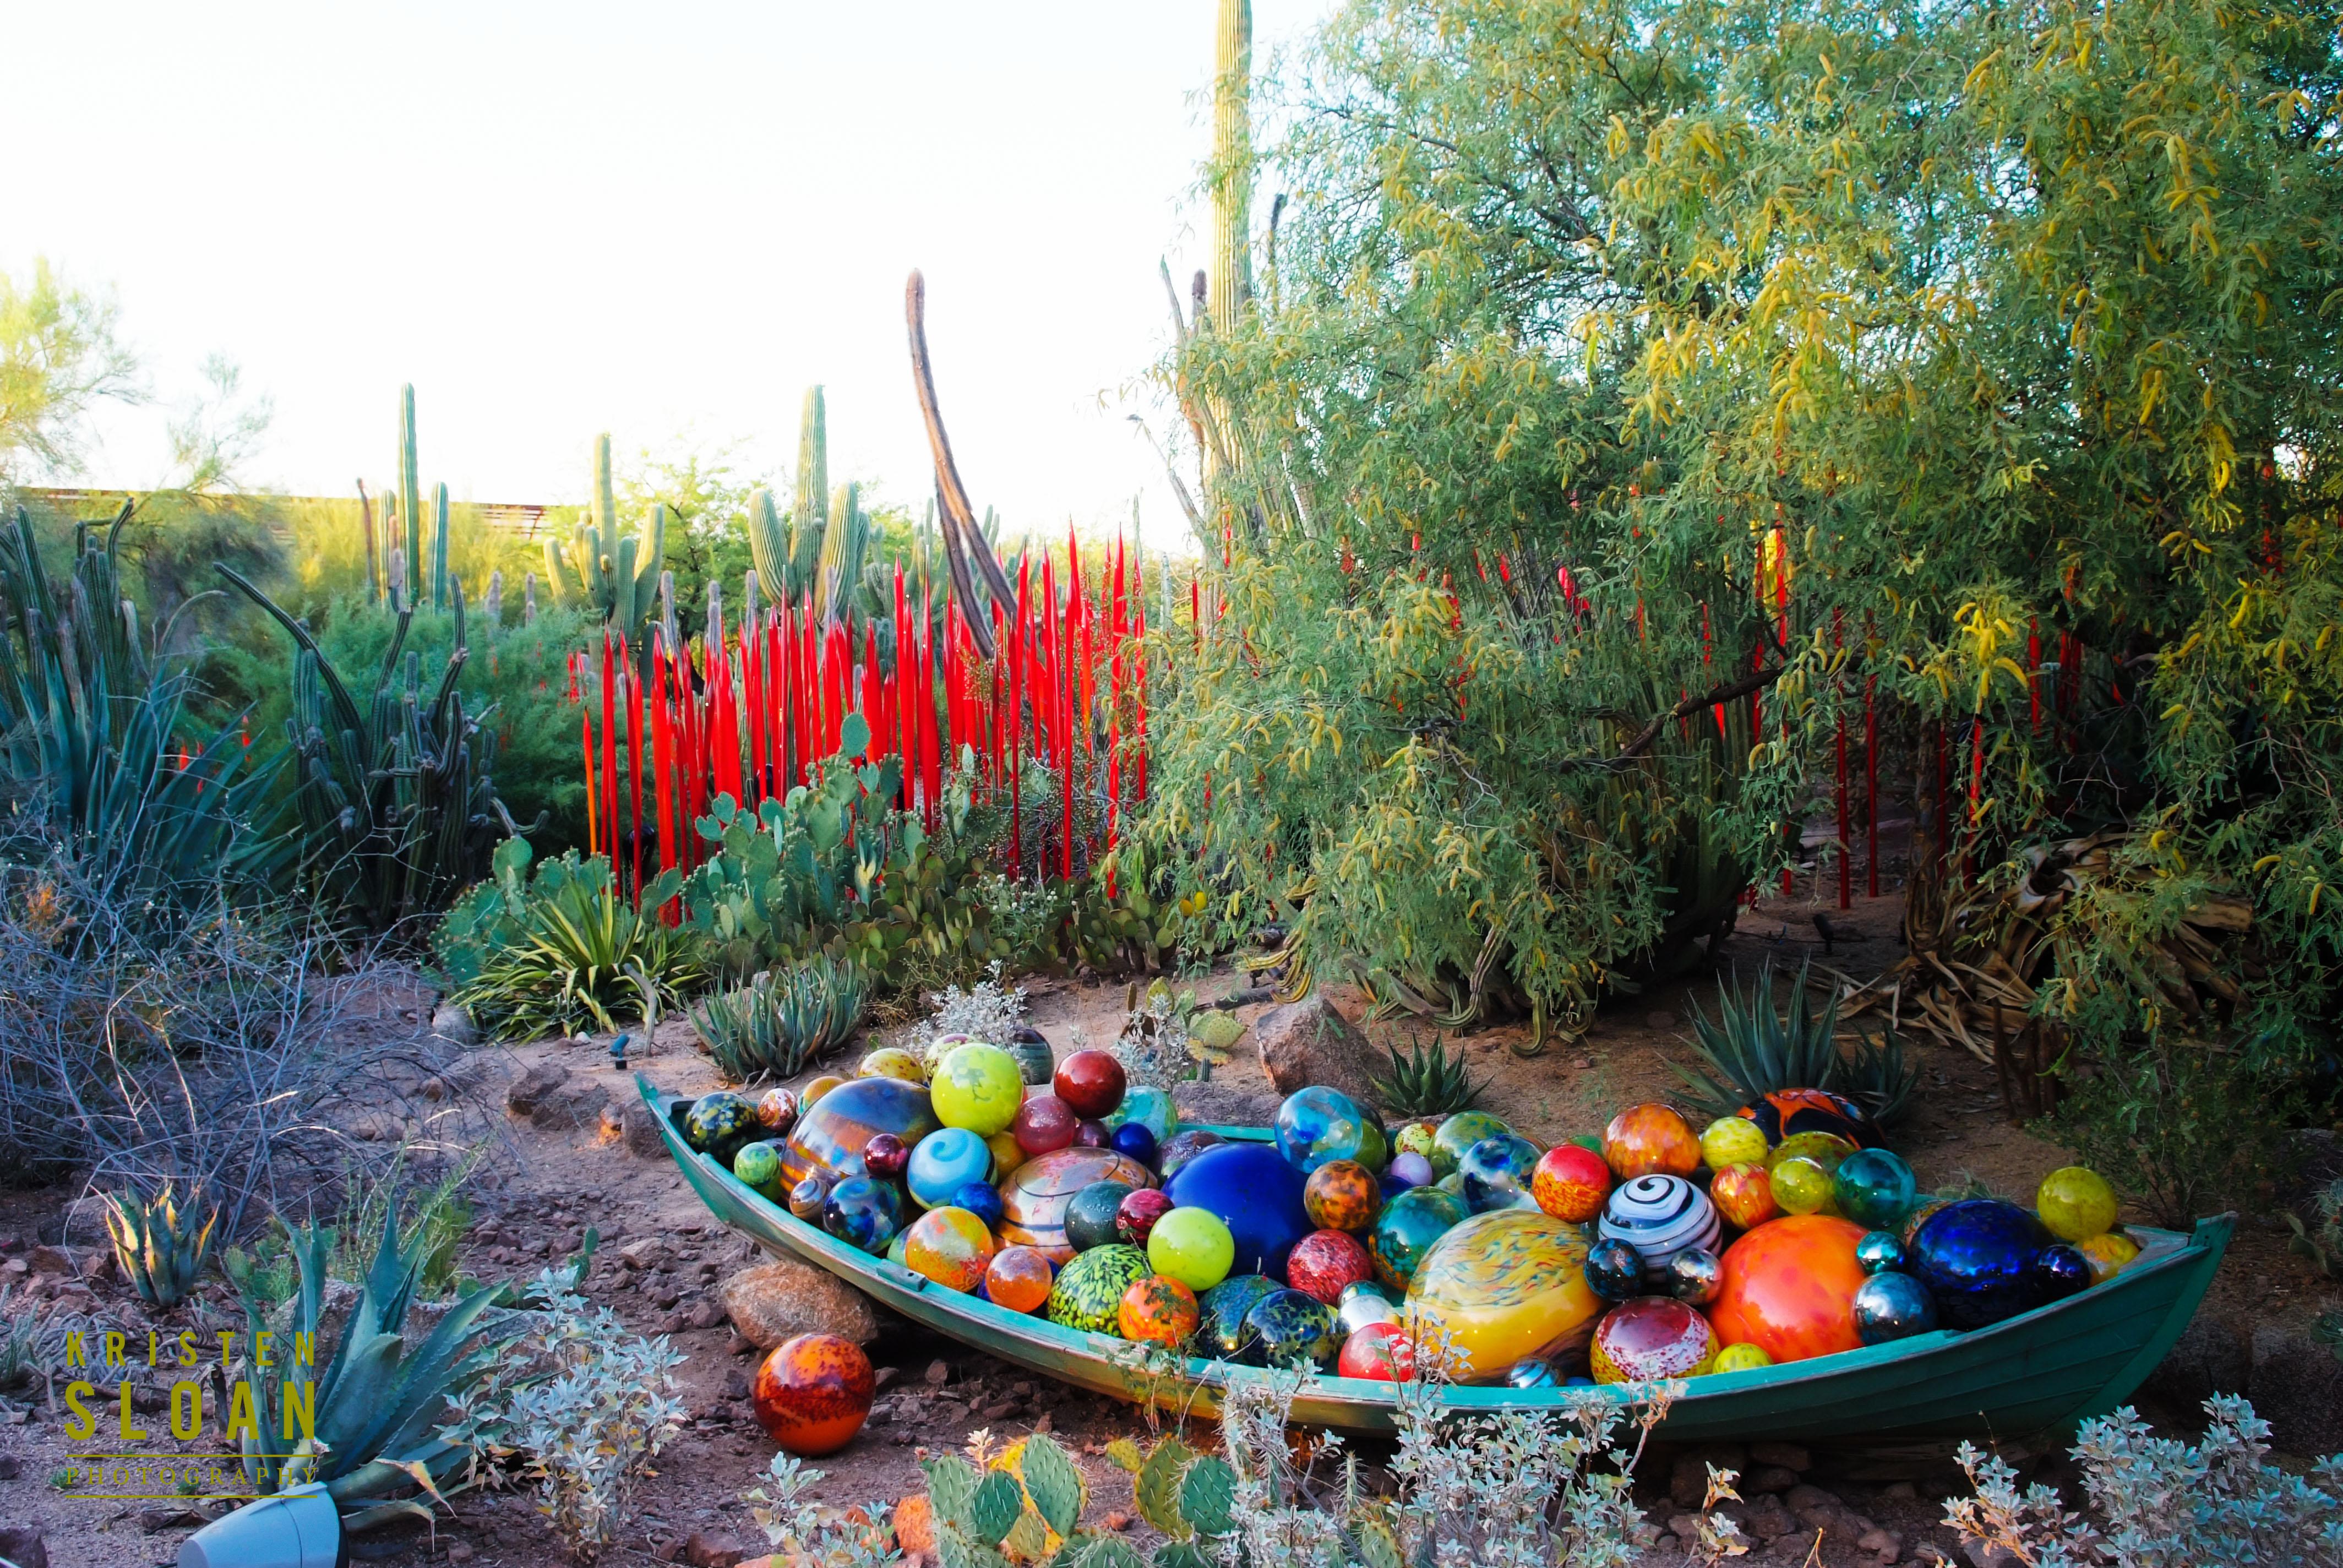 Dale Chihuly Exhibit At The Desert Botanical Gardens Phoenix Arizona Kristen Sloan